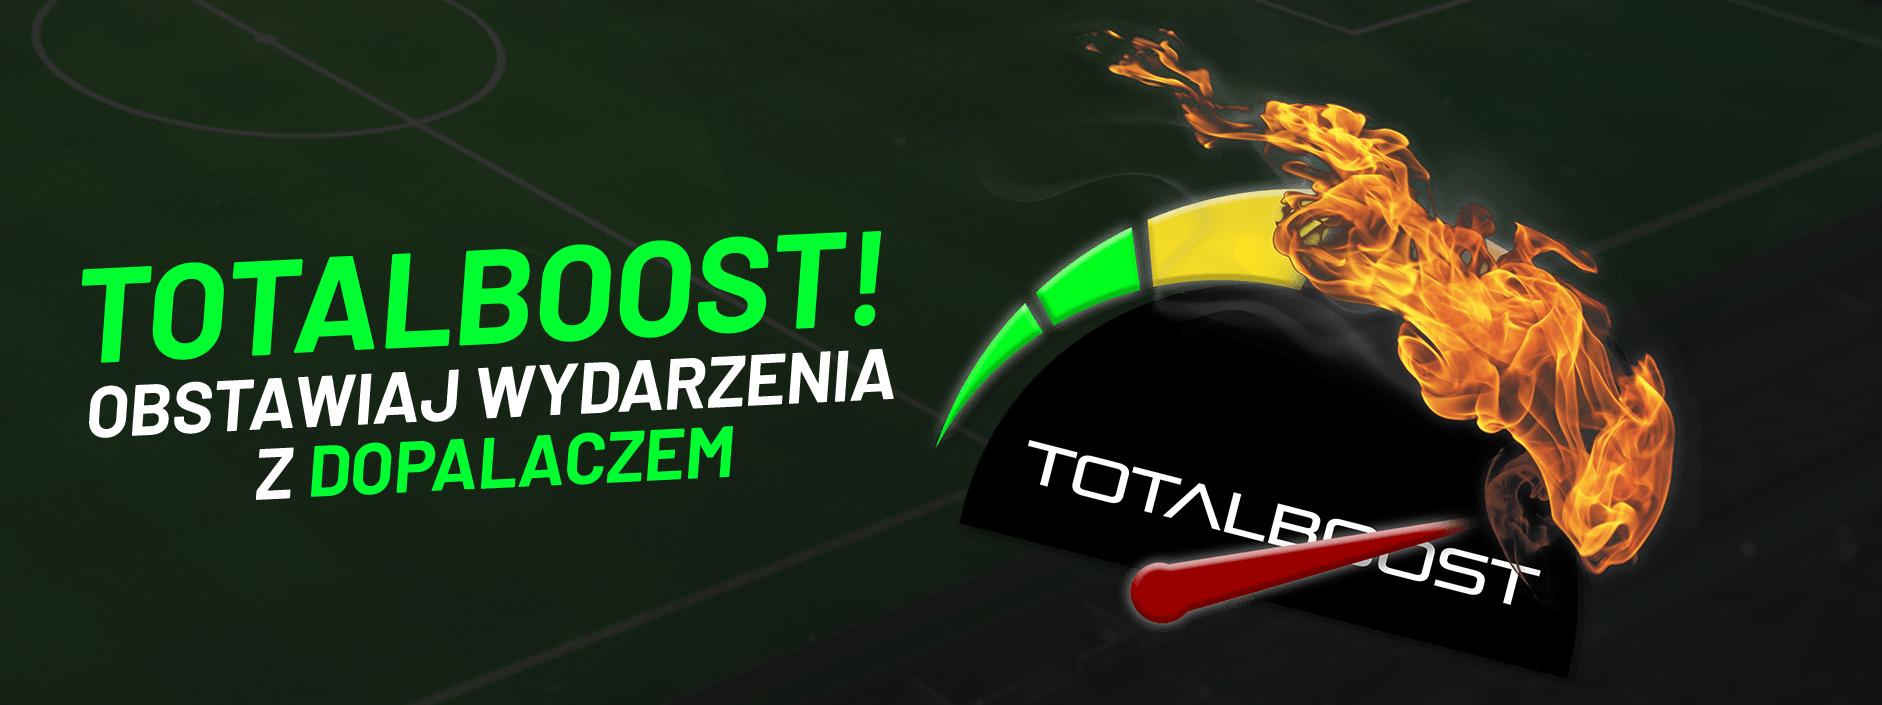 totalboost totalbet